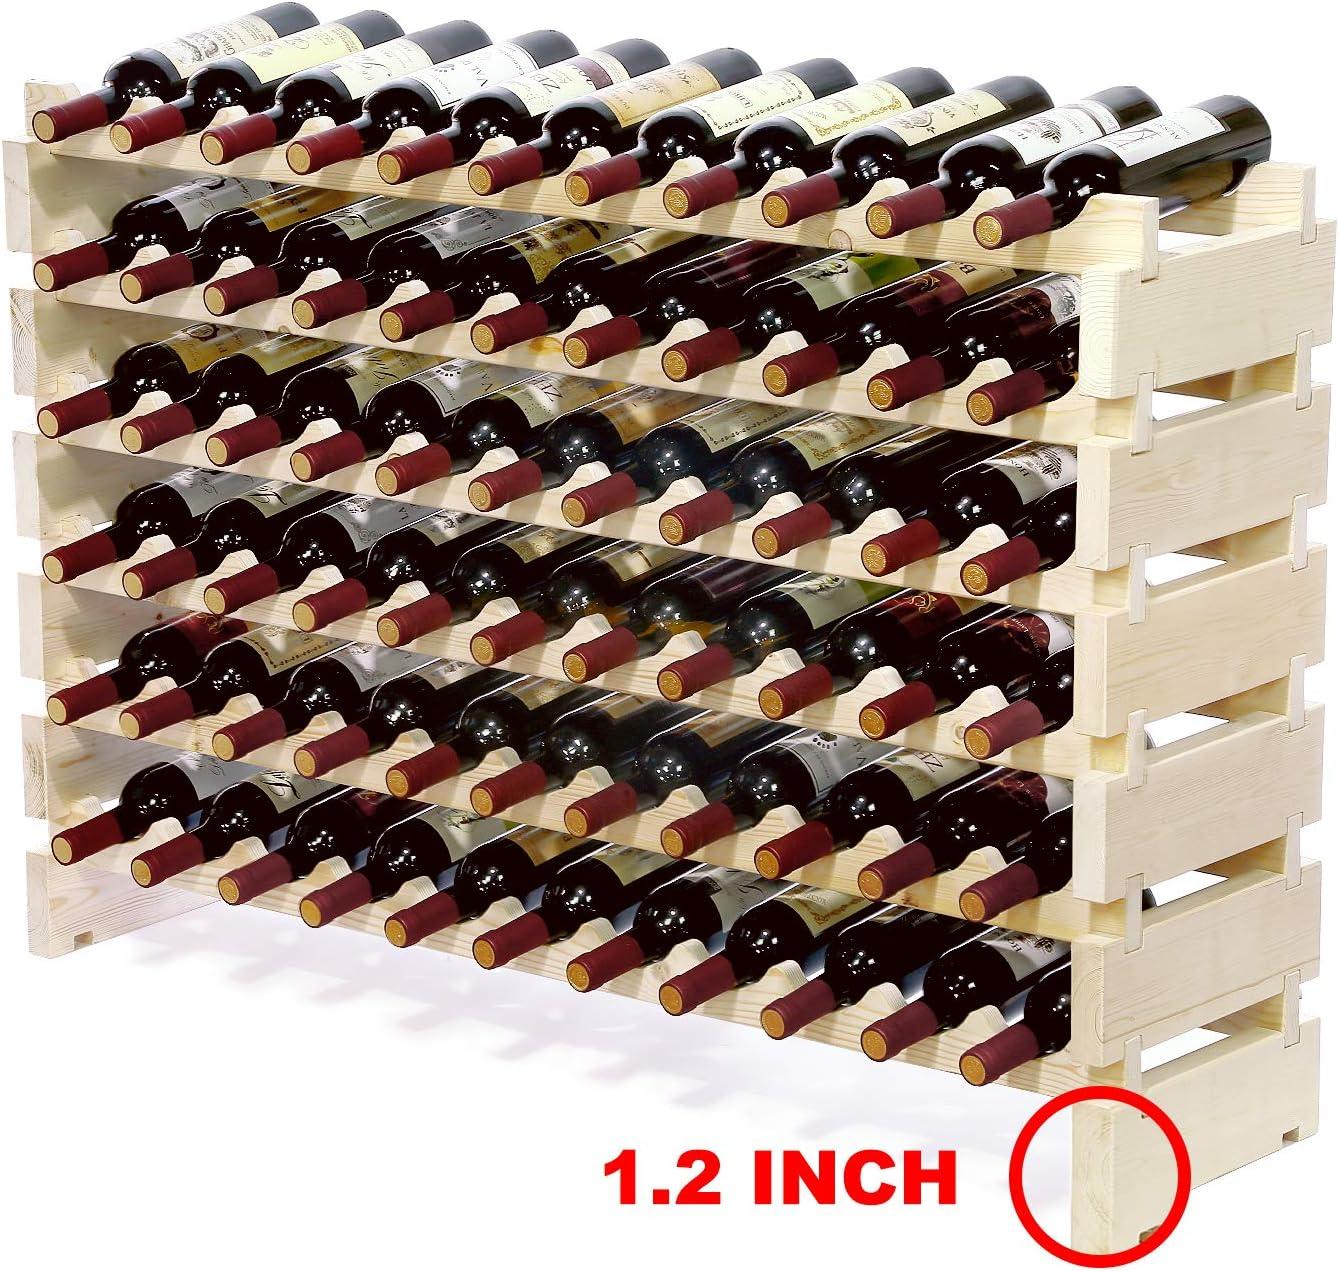 Amazon Com Bonusall 66 Bottle Stackable Modular Wine Rack Large Wine Storage Rack Free Standing Solid Natural Wood Wine Holder Display Shelves Wobble Free Six Tier 66 Bottle Capacity Garden Outdoor